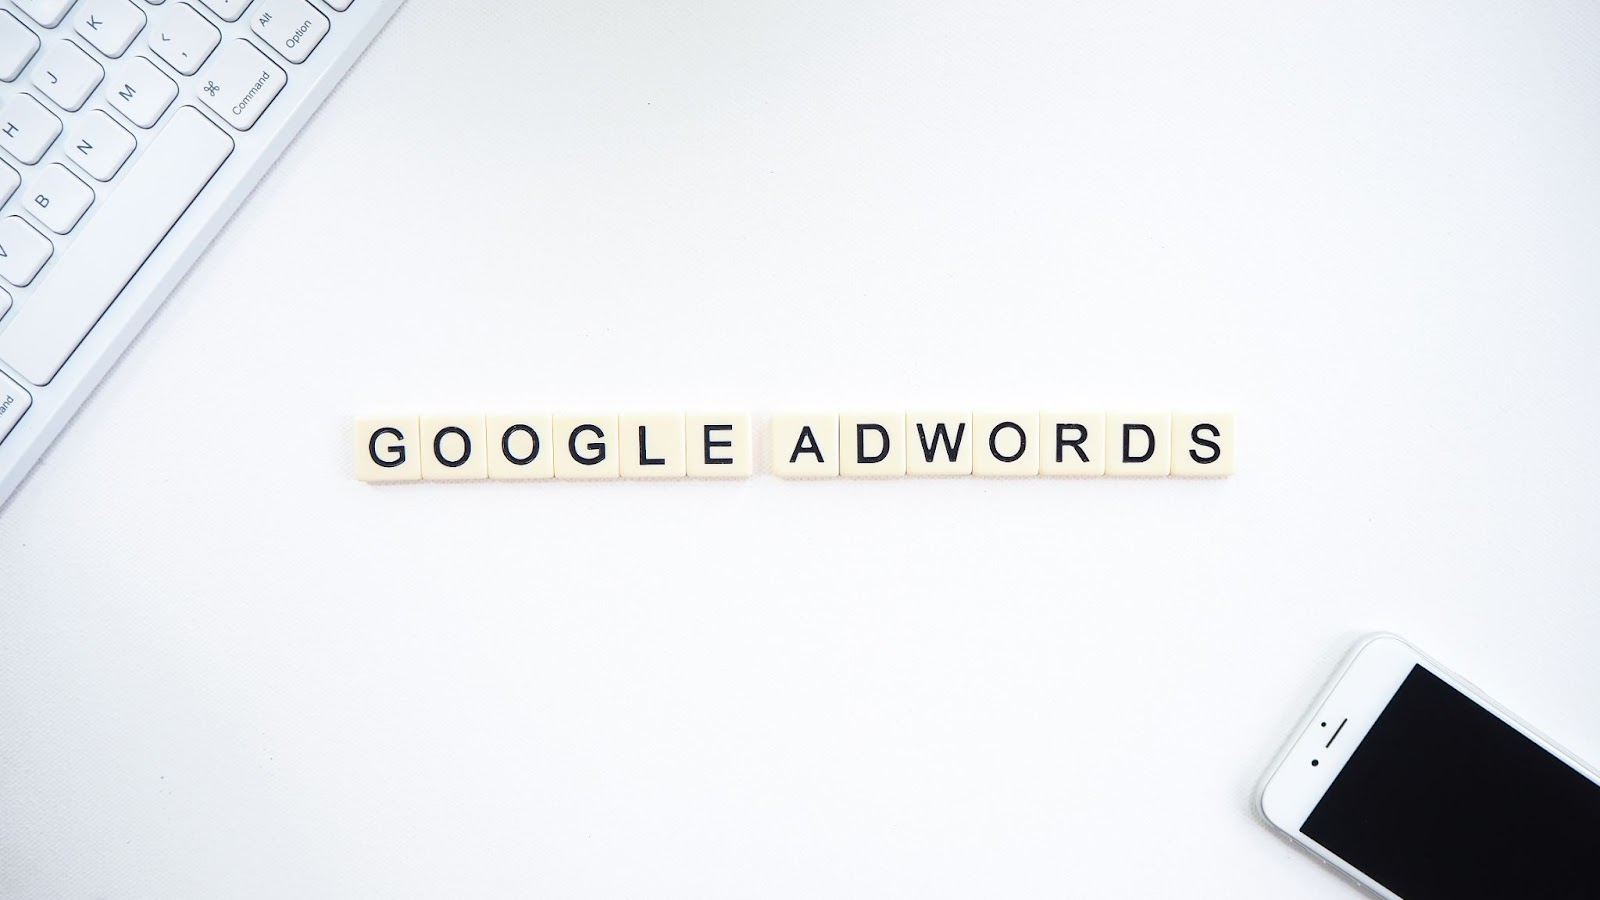 Google ads in scrabble letters